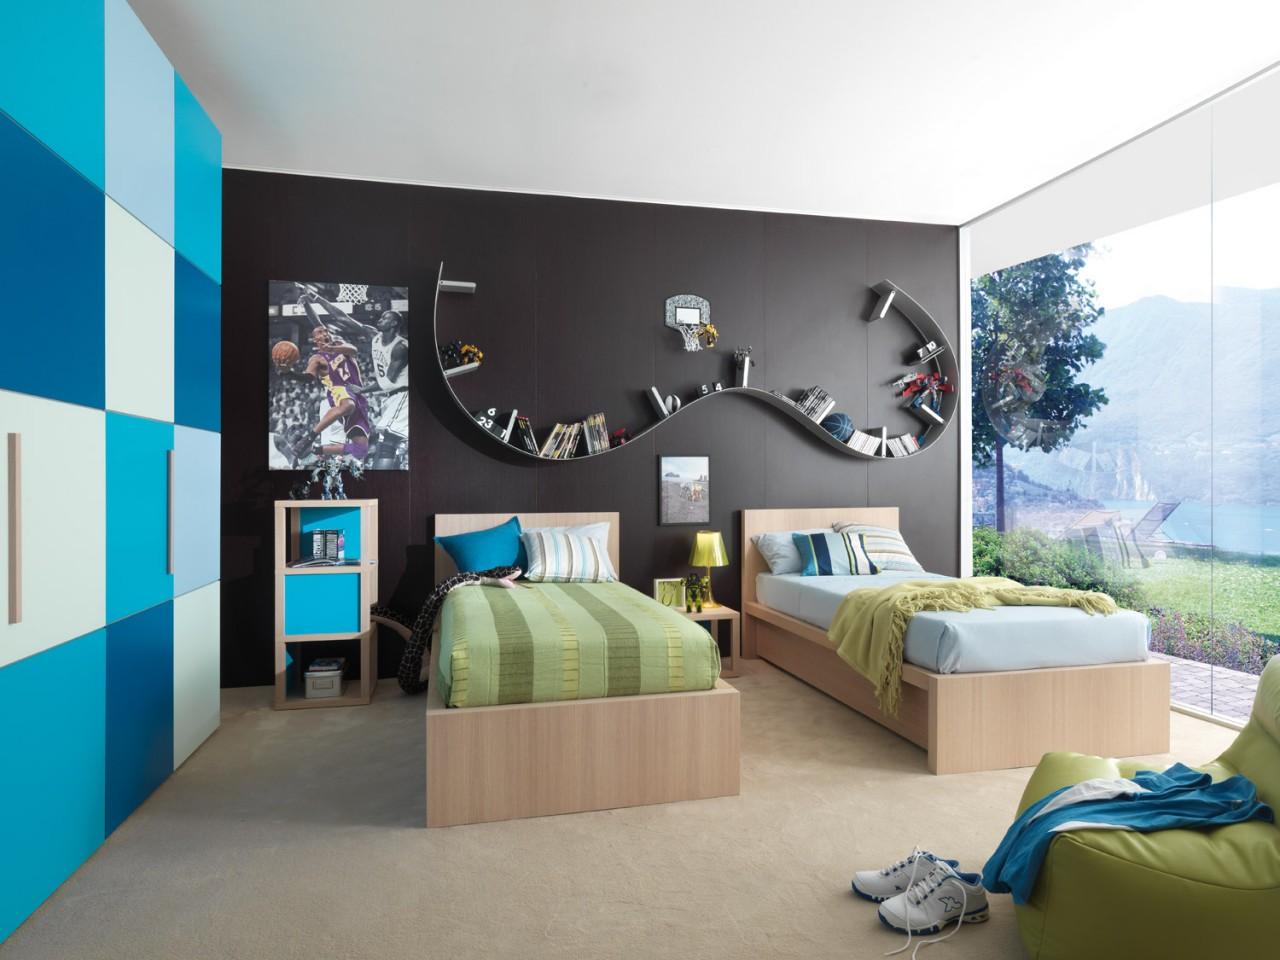 Fotos de dormitorios juveniles para dos chicos - Decoracion de paredes de dormitorios juveniles ...